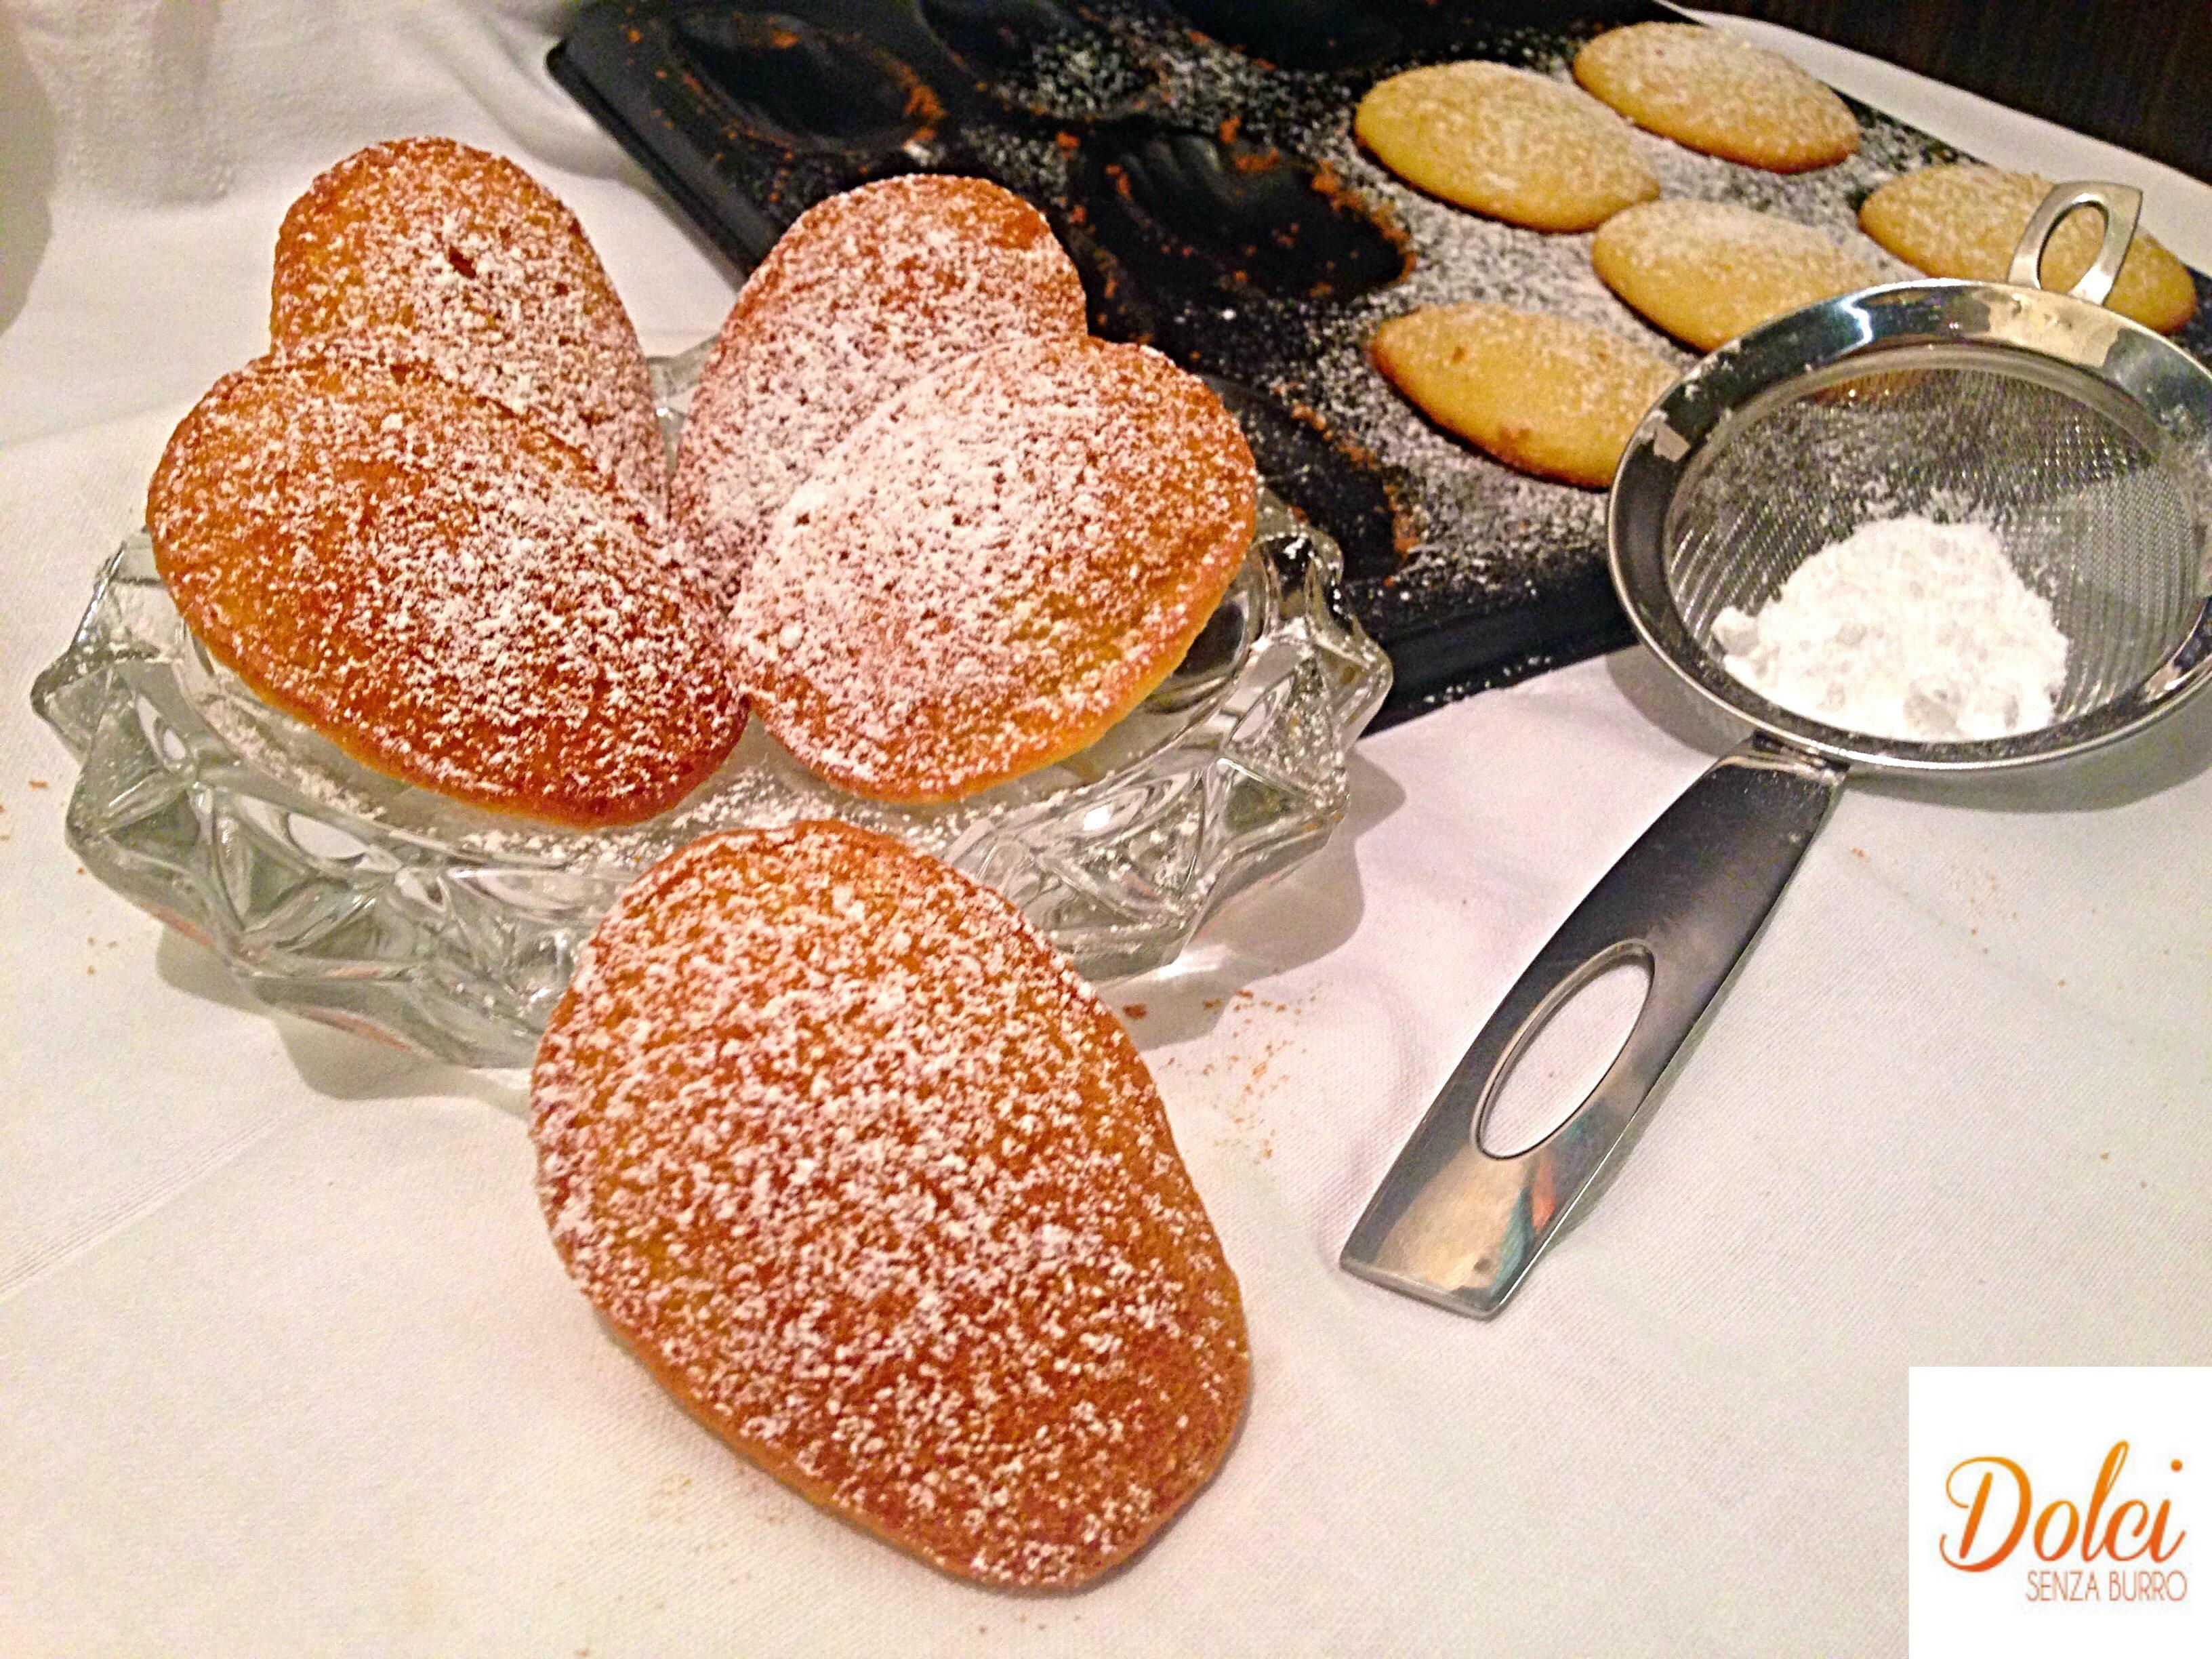 Madeleine Light, i famosi dolci francesi in versione leggera di dolci senza burro